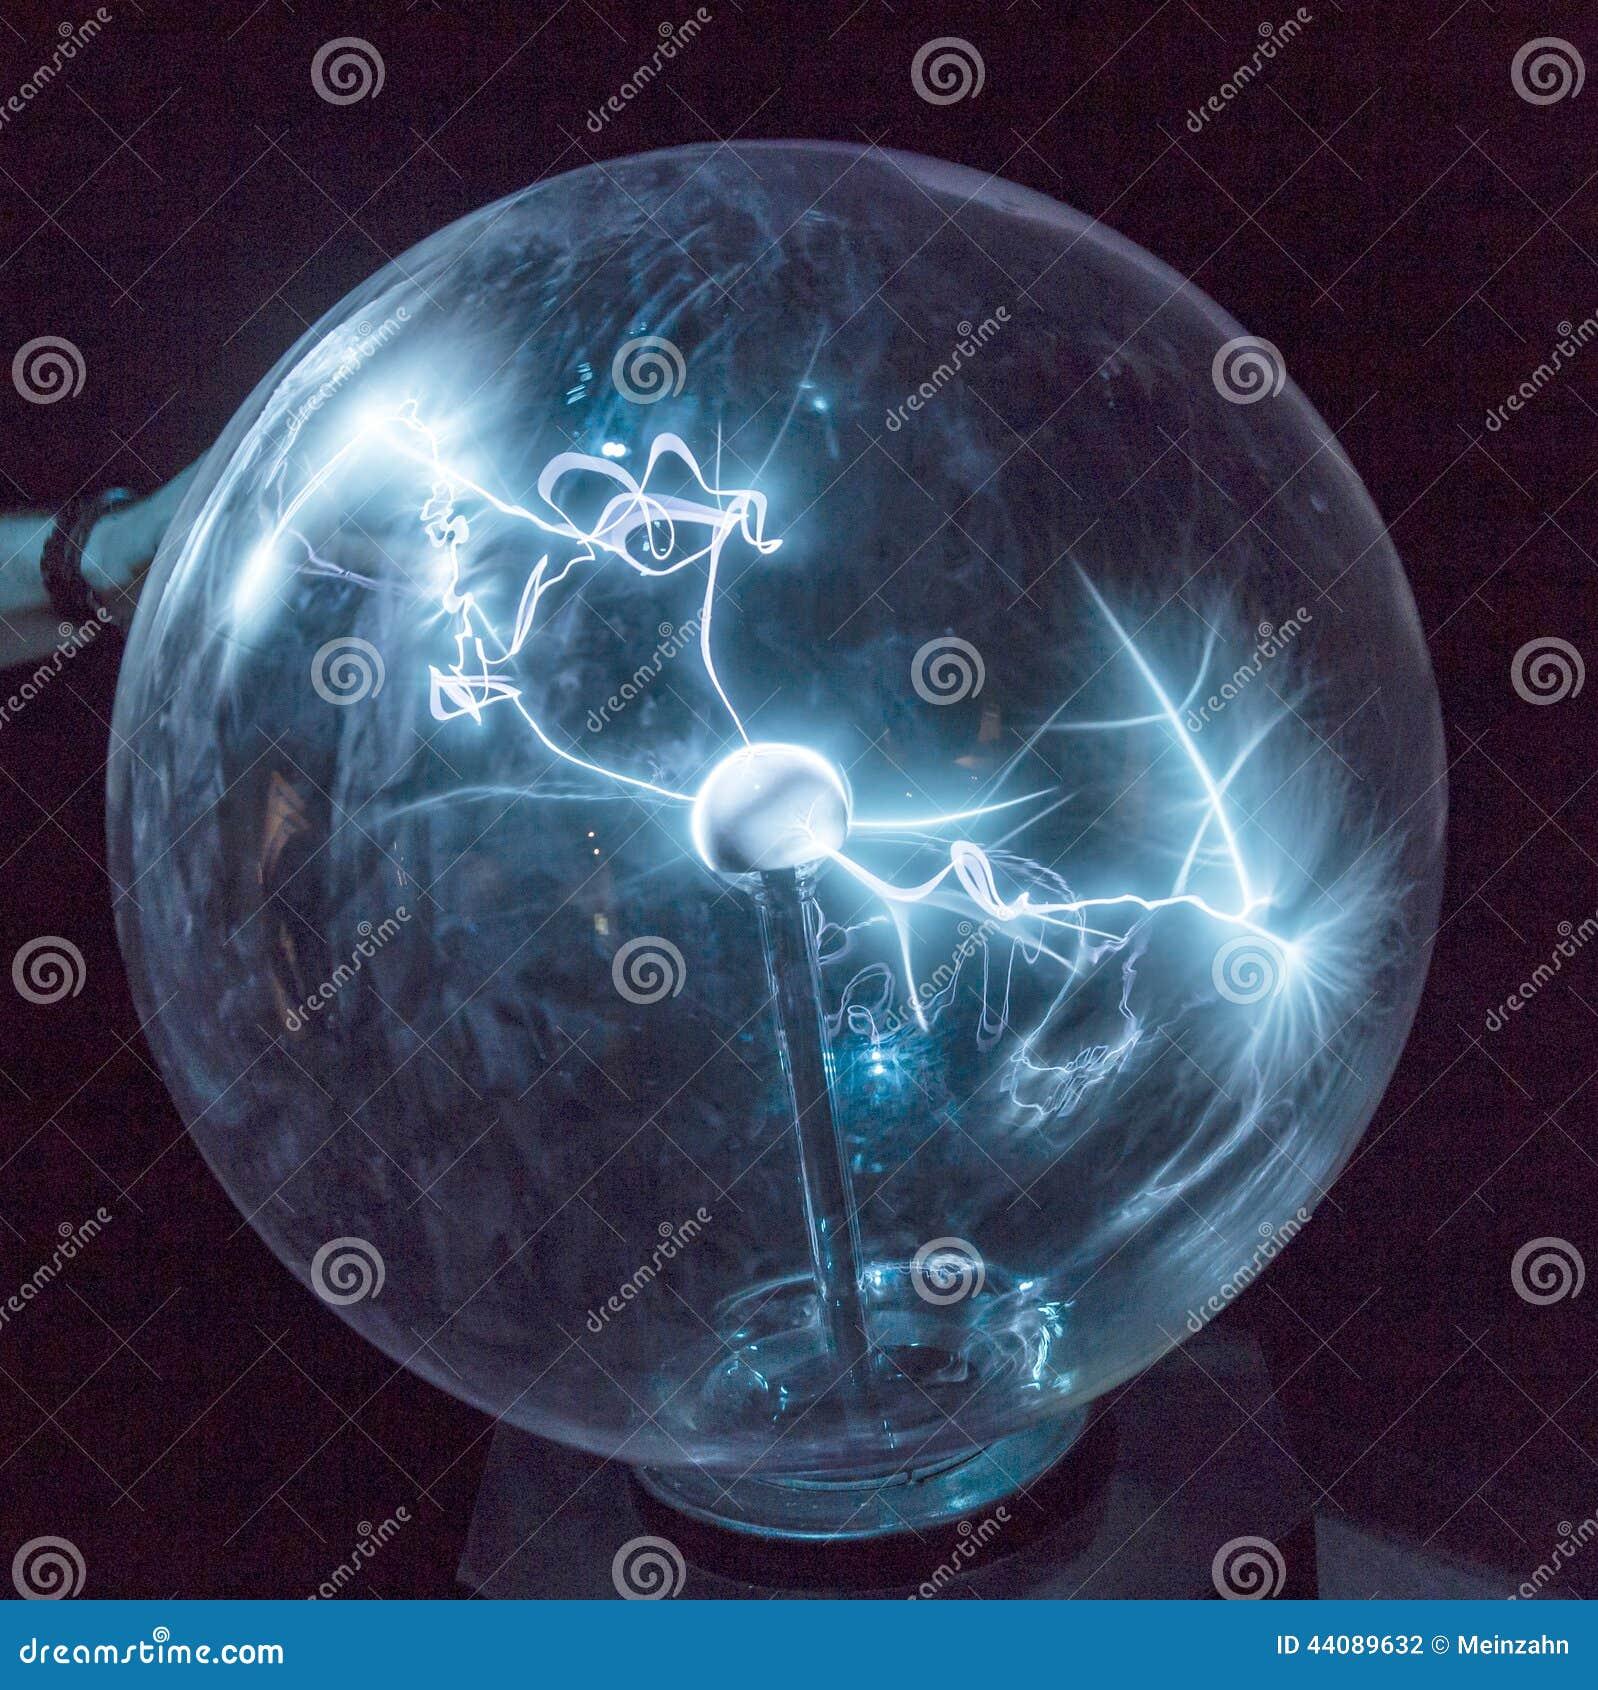 how to create a plasma ball